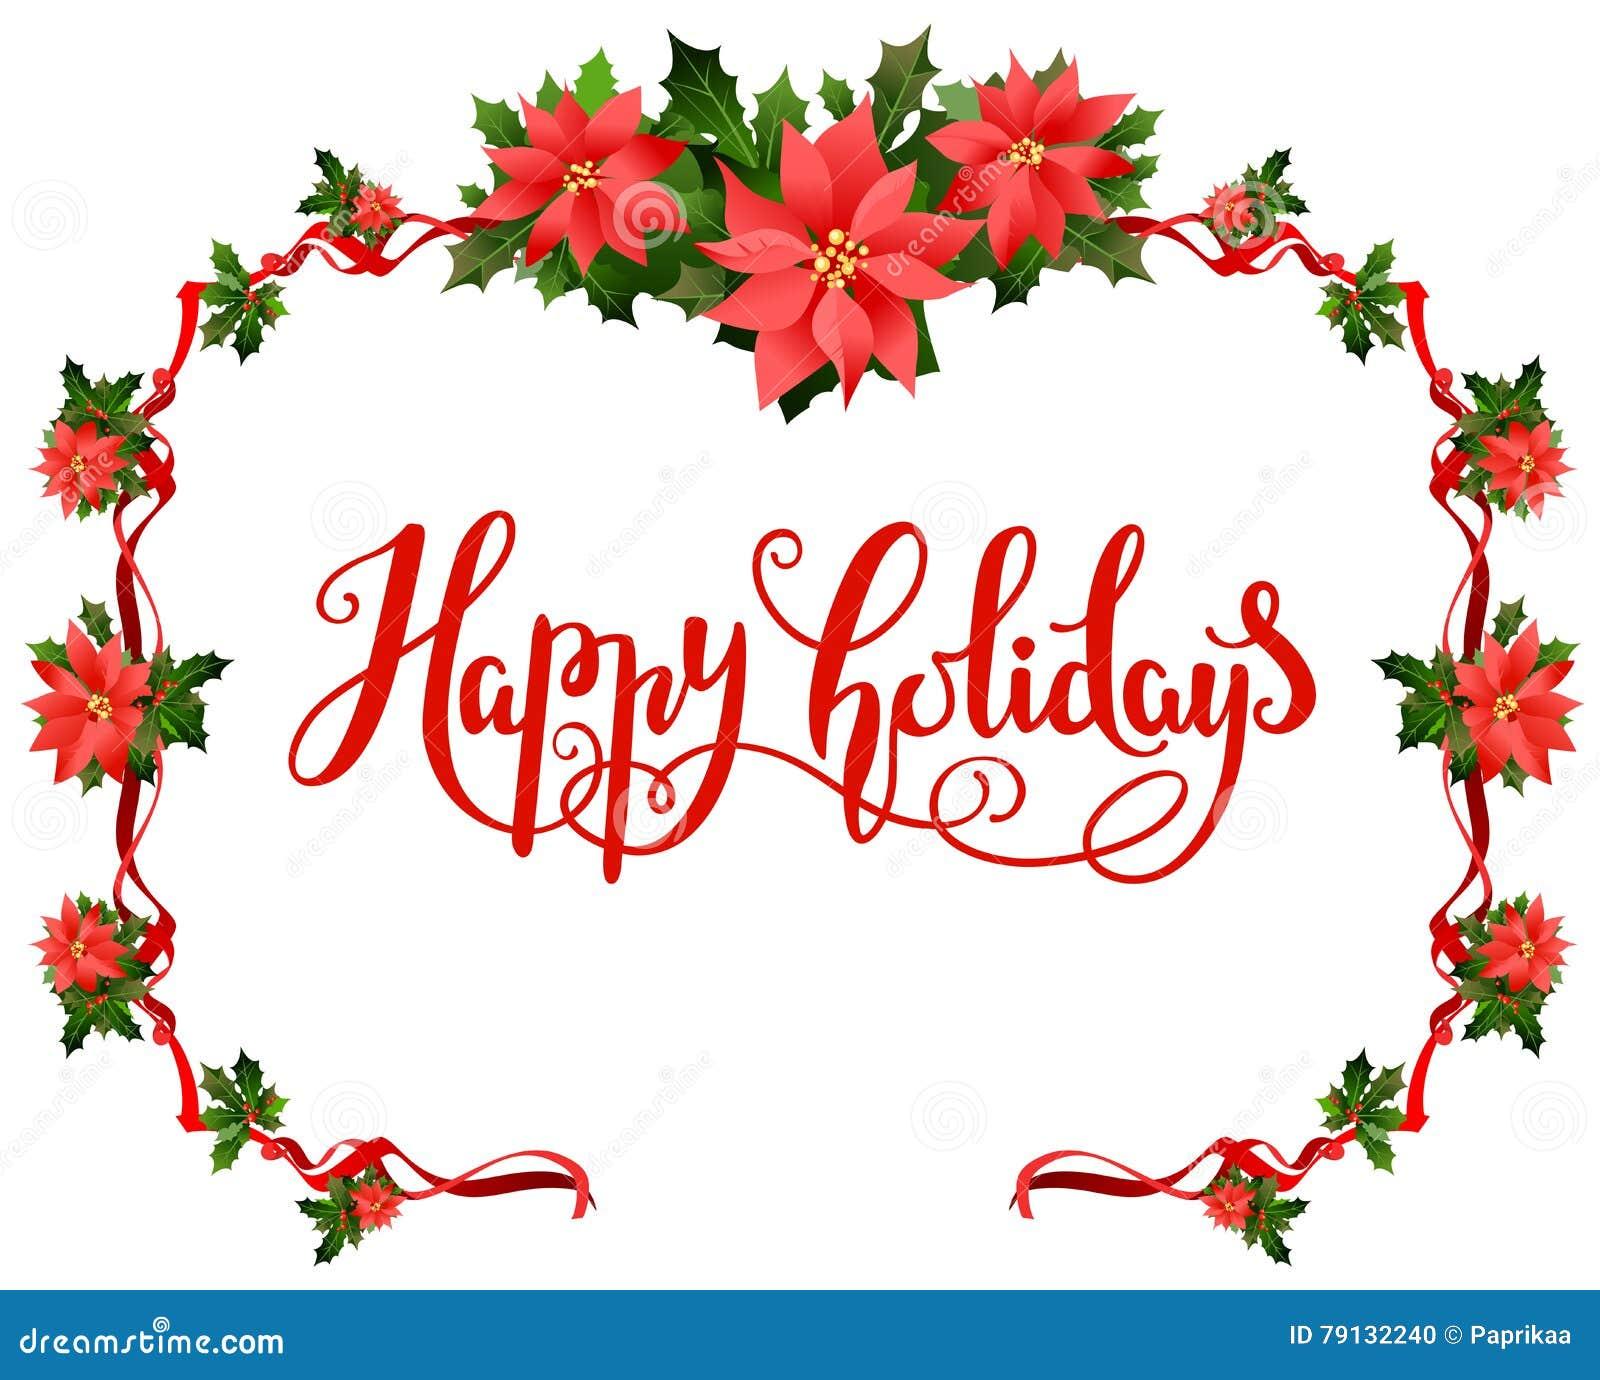 Seasons greetings frame stock vector illustration of greeting seasons greetings frame kristyandbryce Choice Image